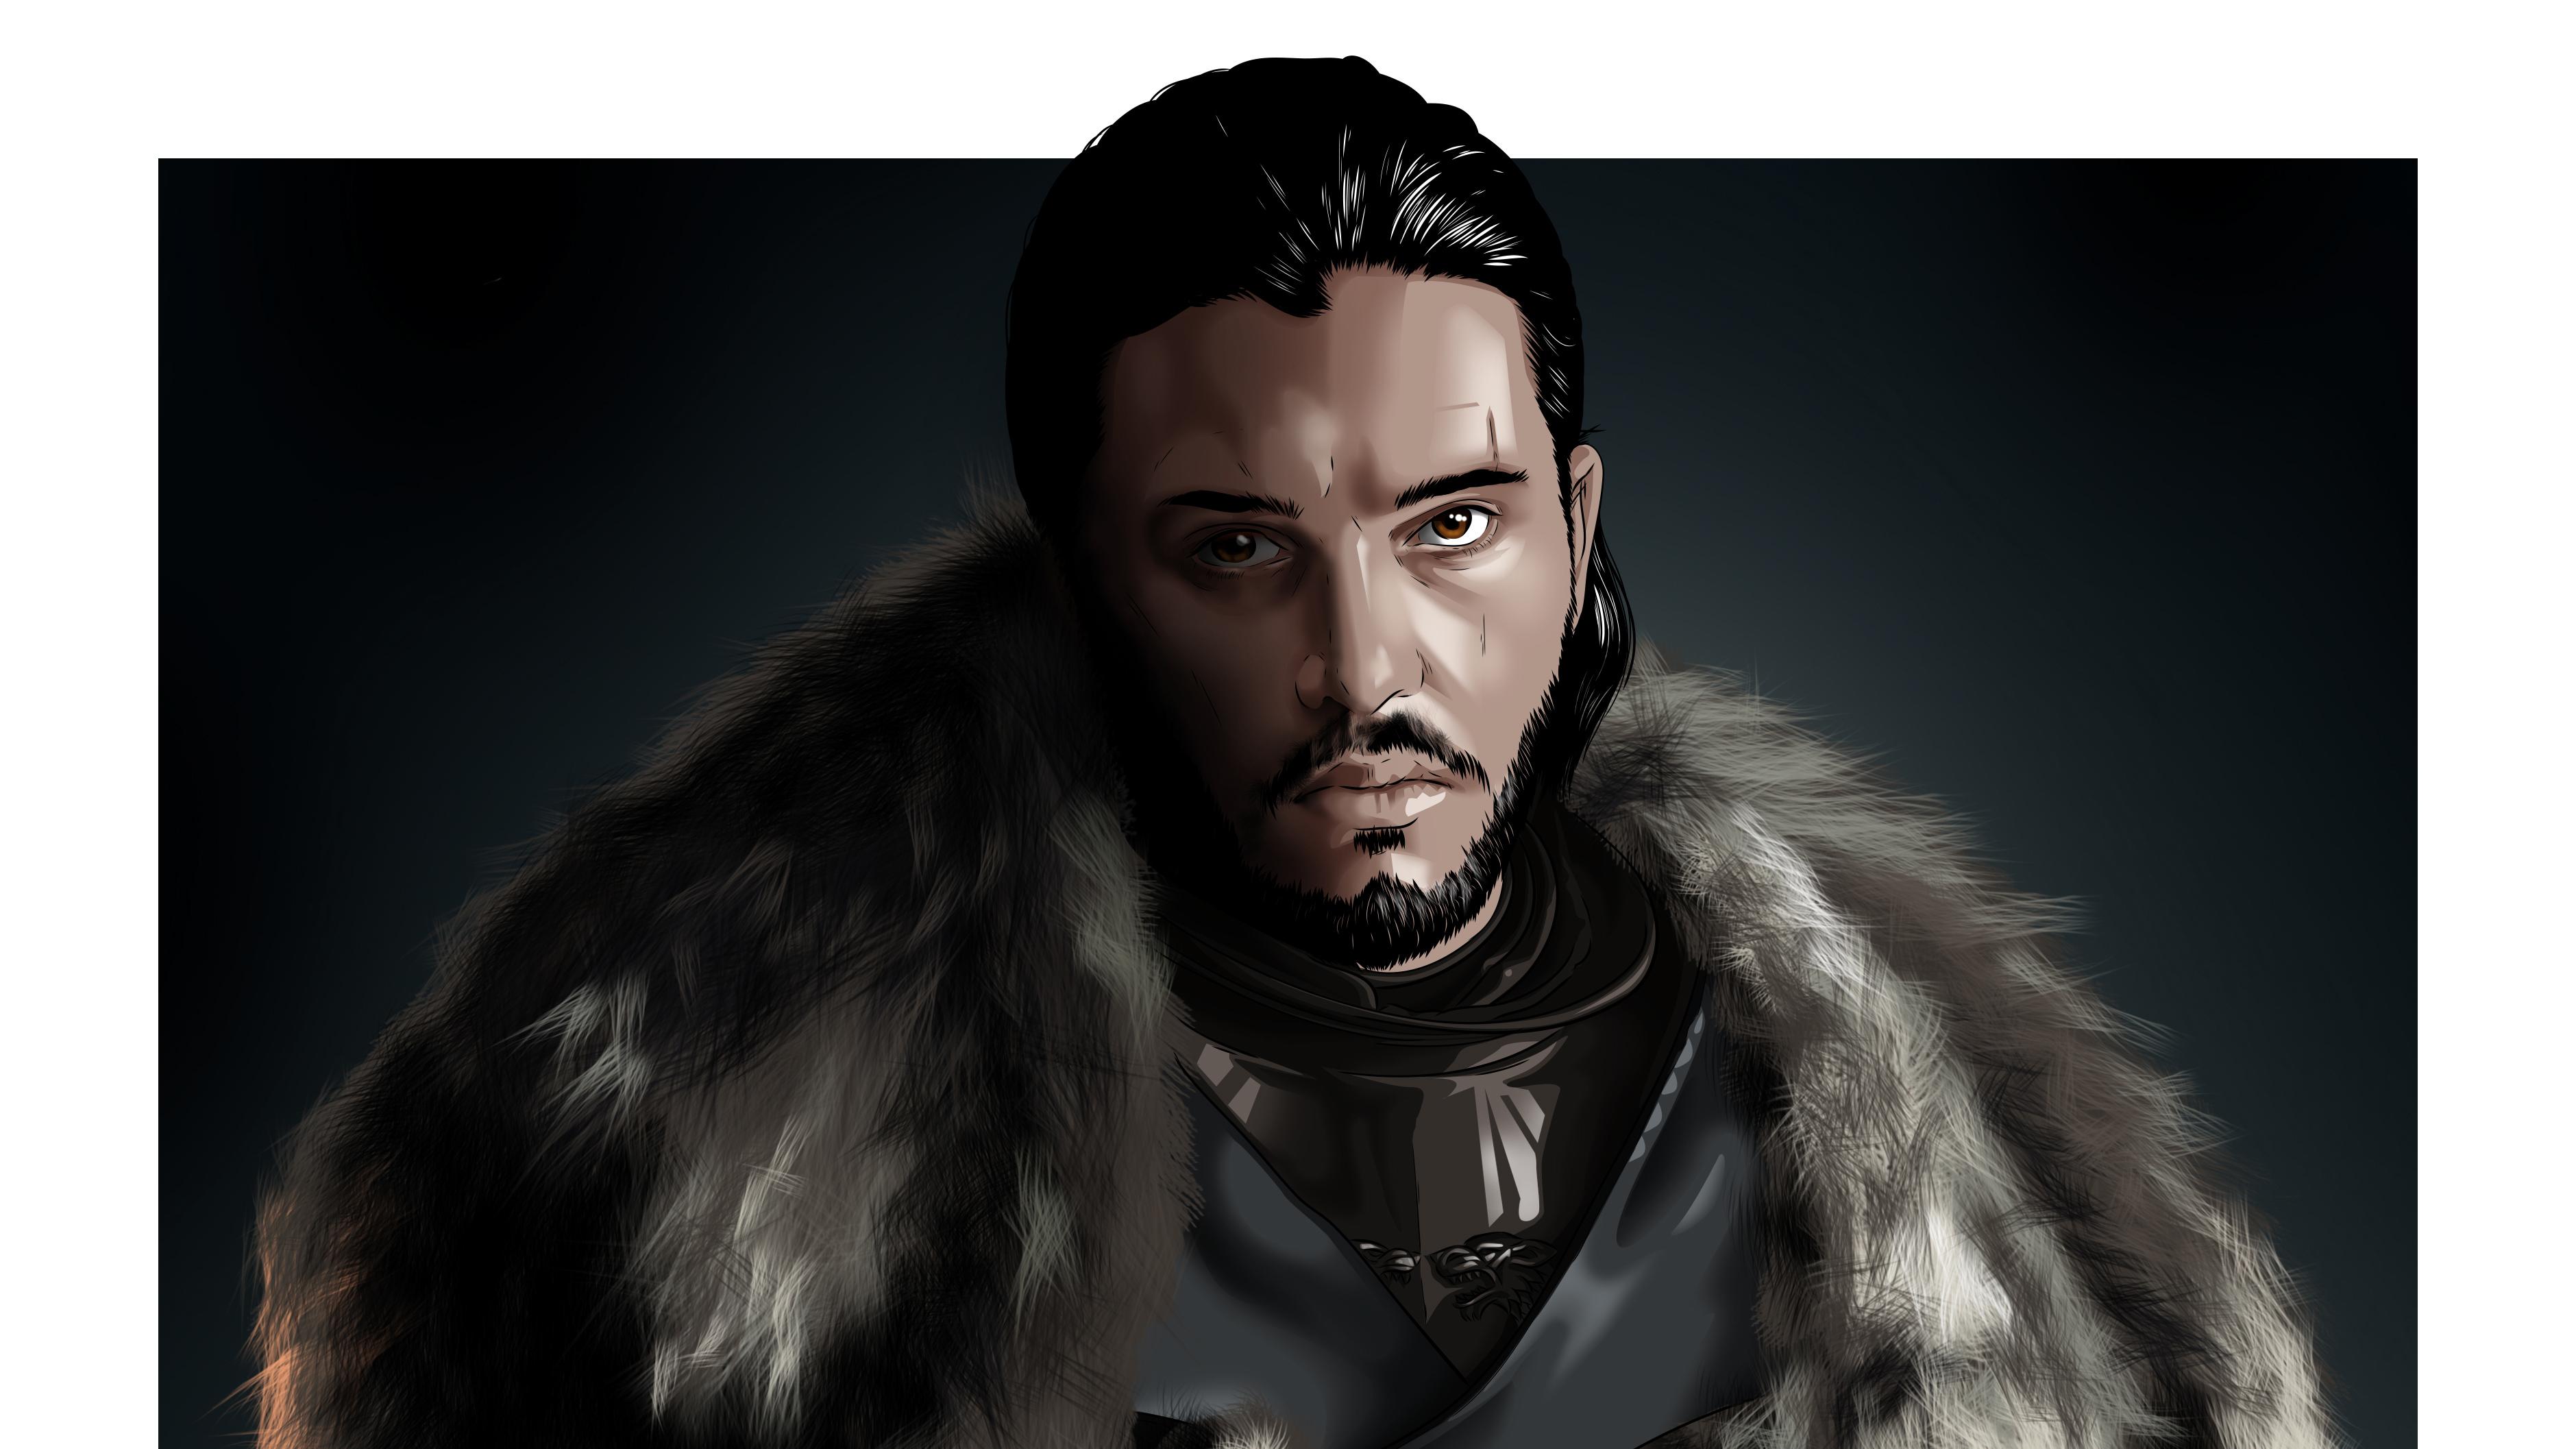 Jon Snow Game Of Thrones Digital Art Hd Tv Shows 4k Wallpapers